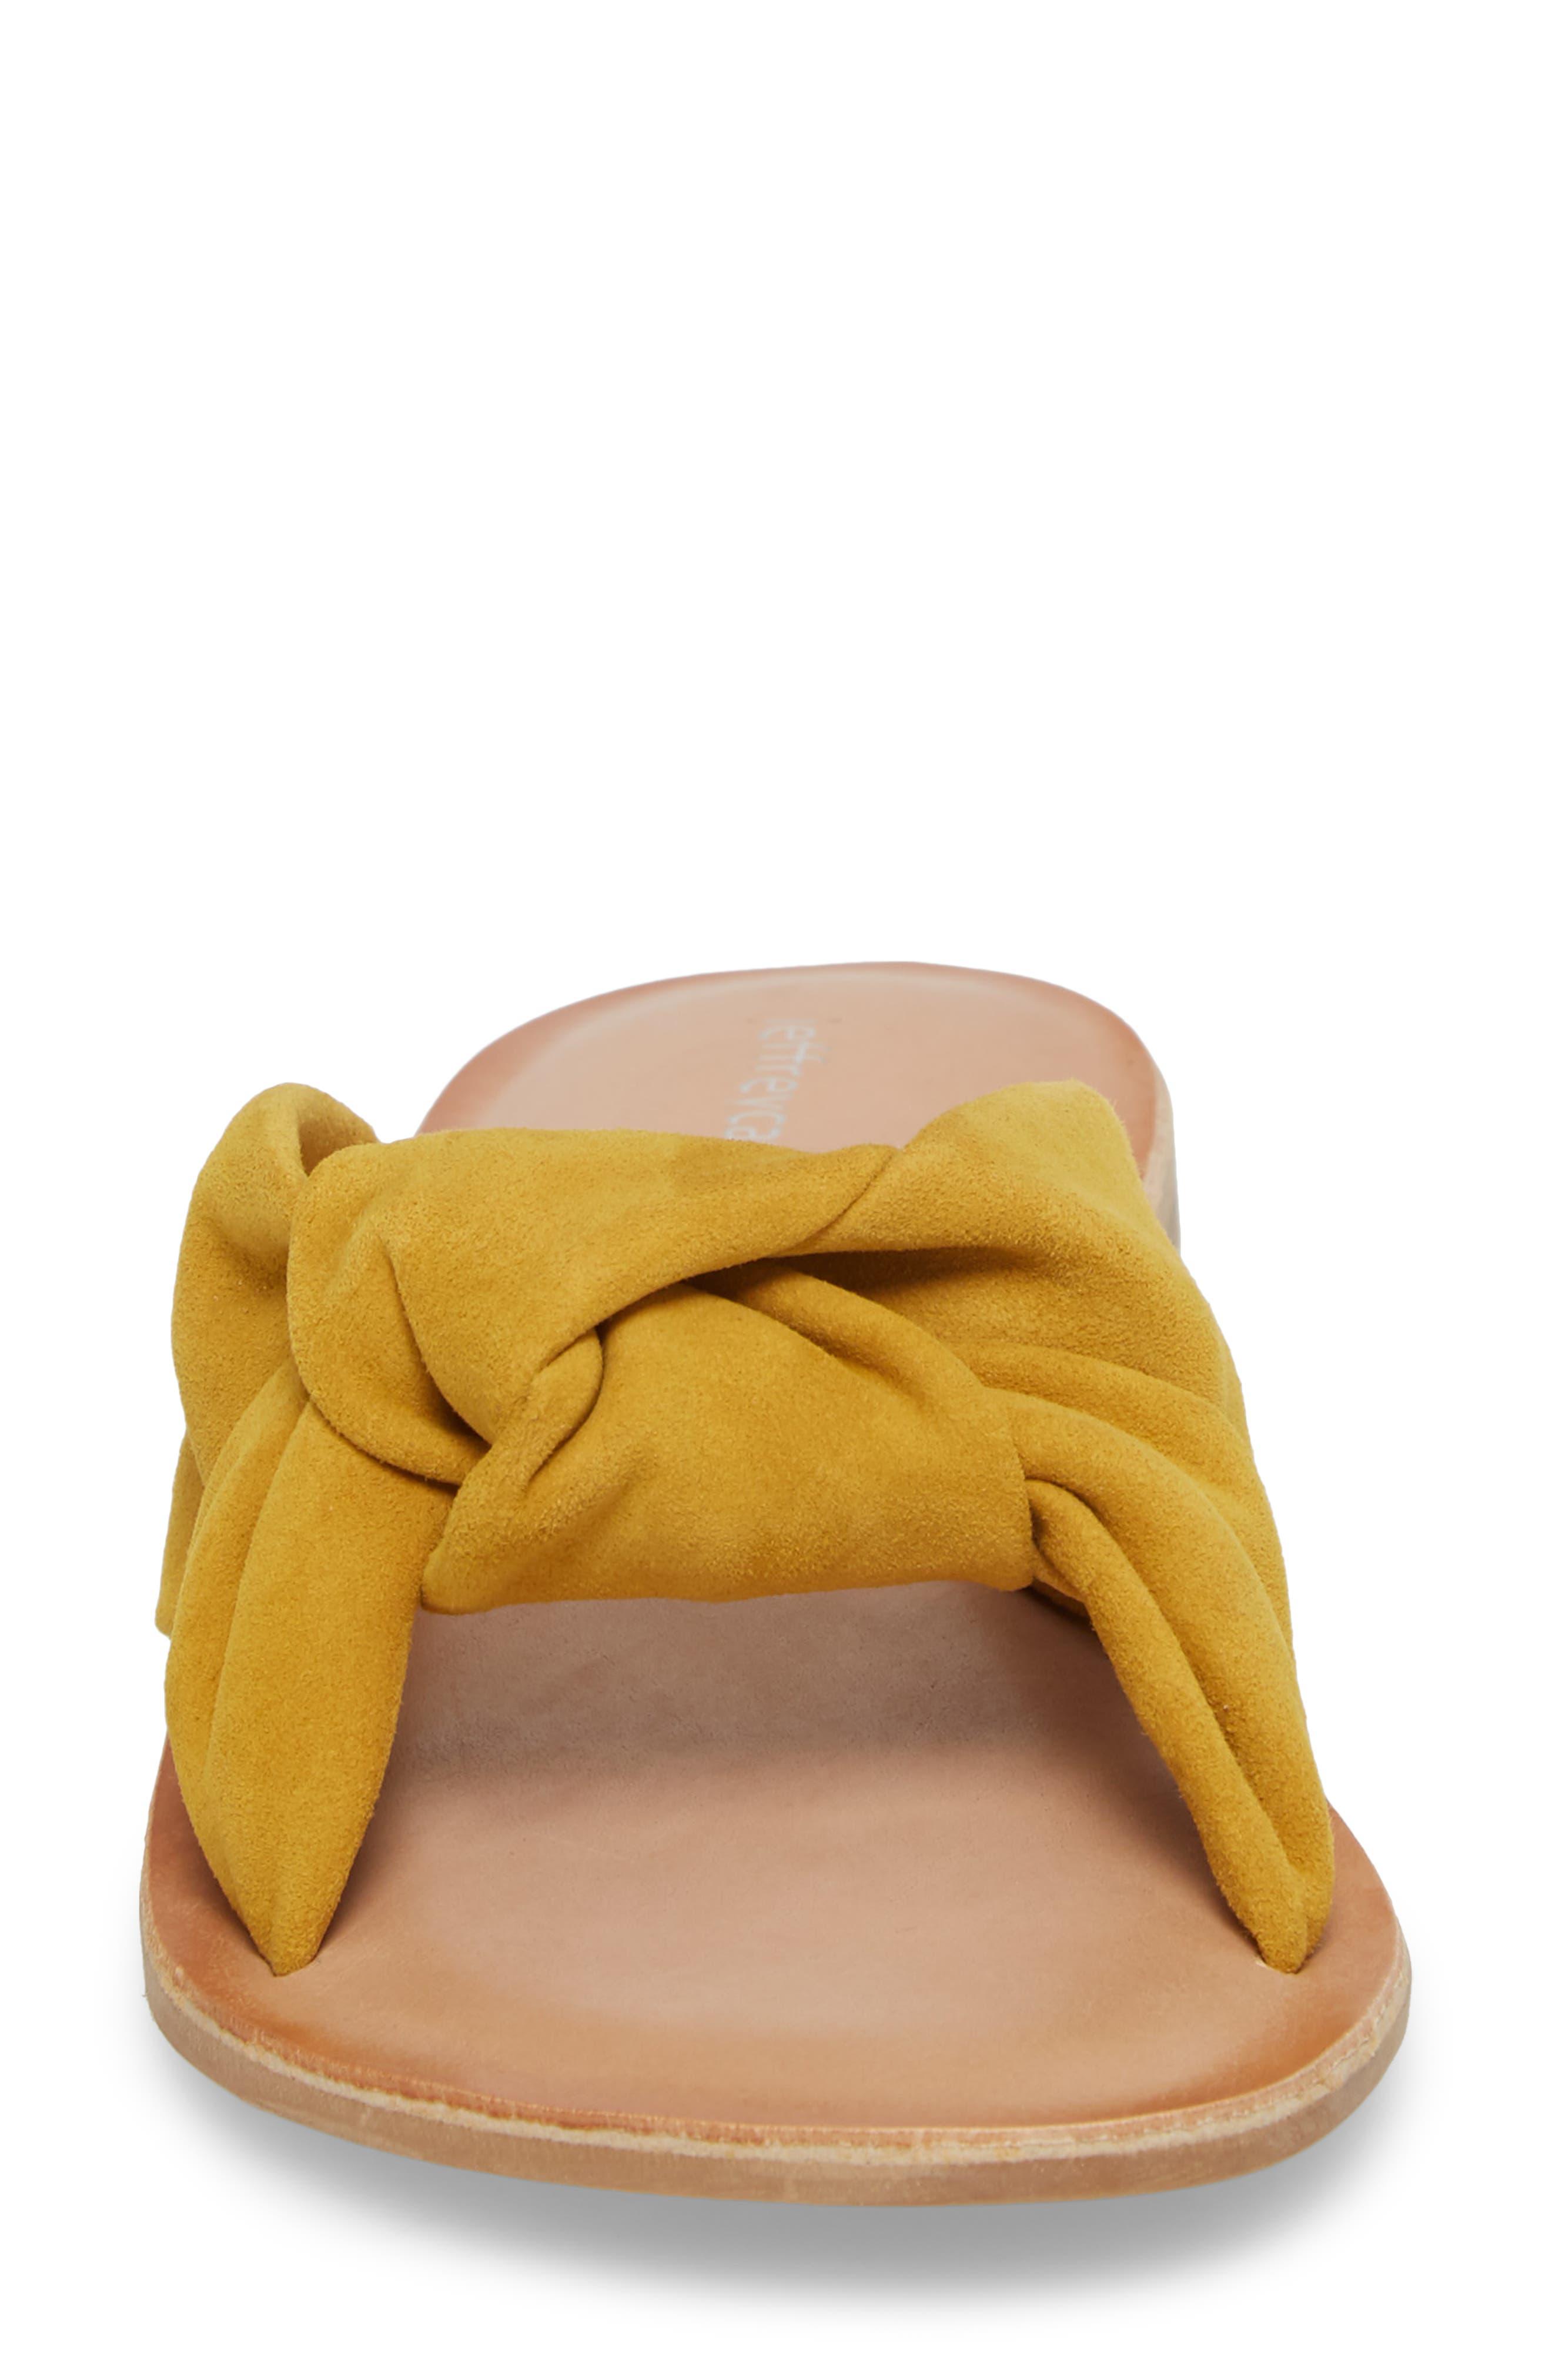 Zocalo Slide Sandal,                             Alternate thumbnail 4, color,                             Mustard Suede